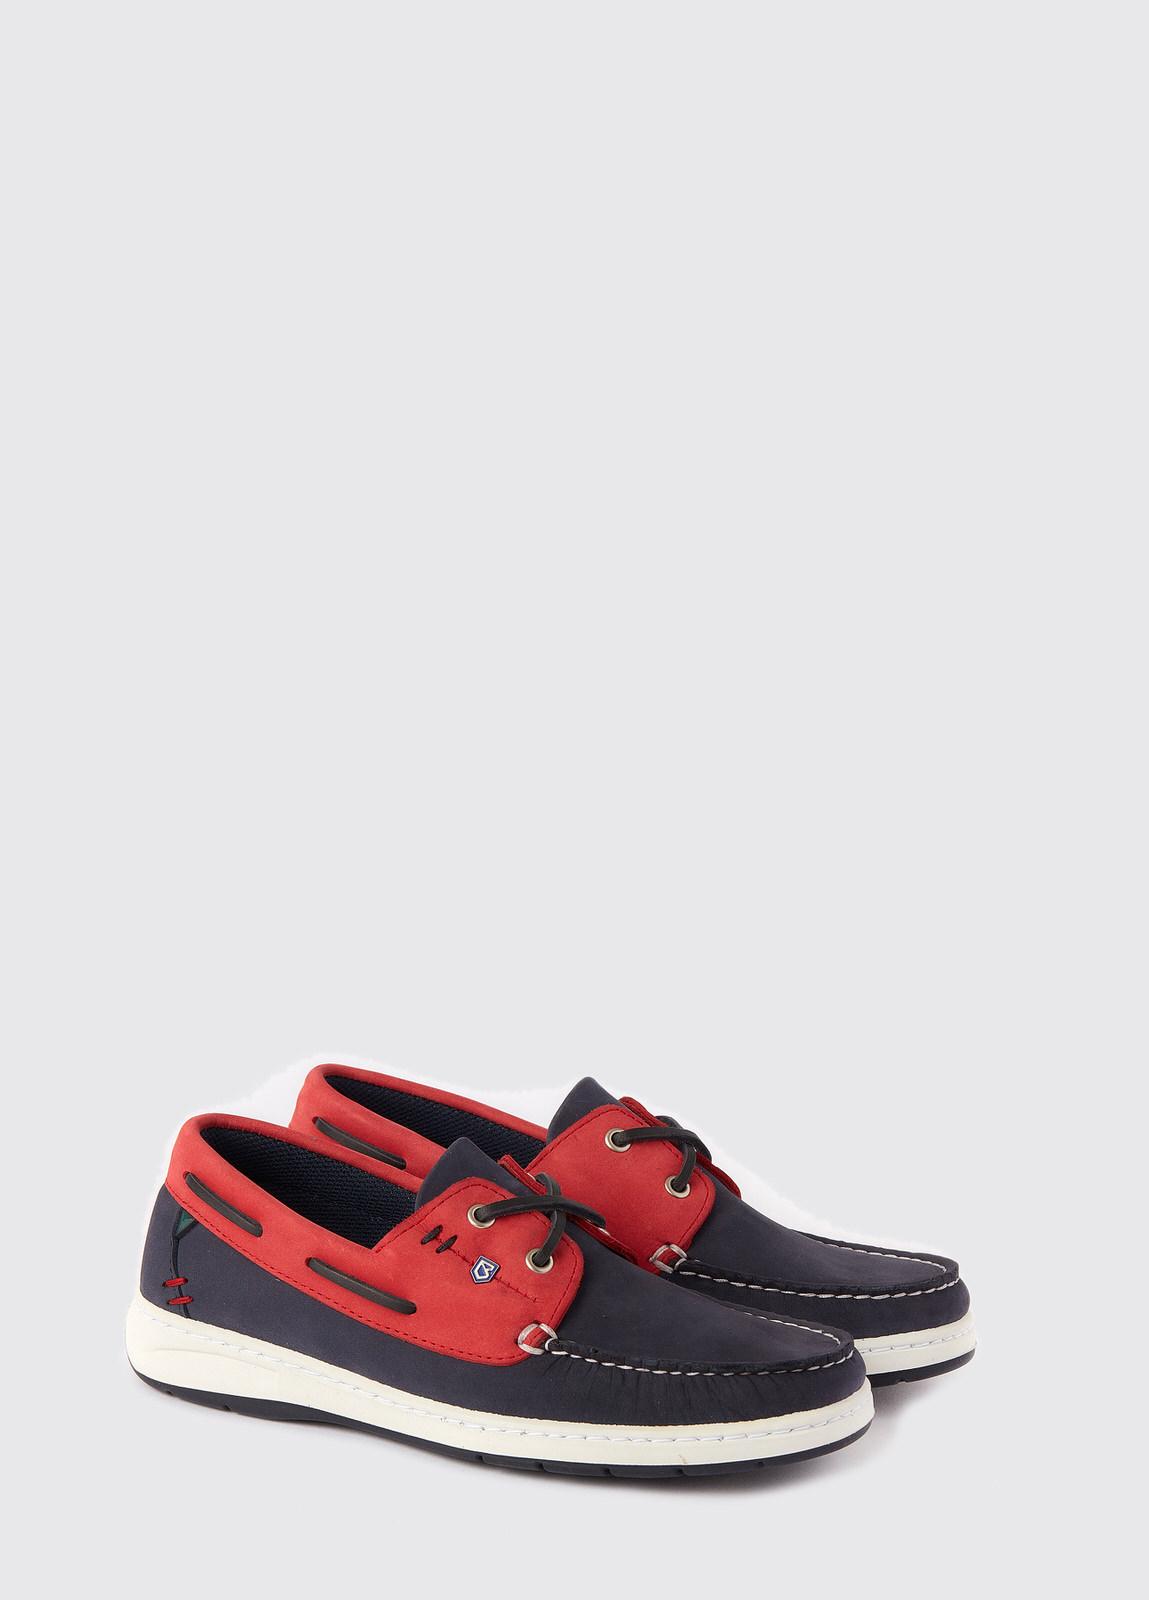 Florida Deck shoes - Denim/Red